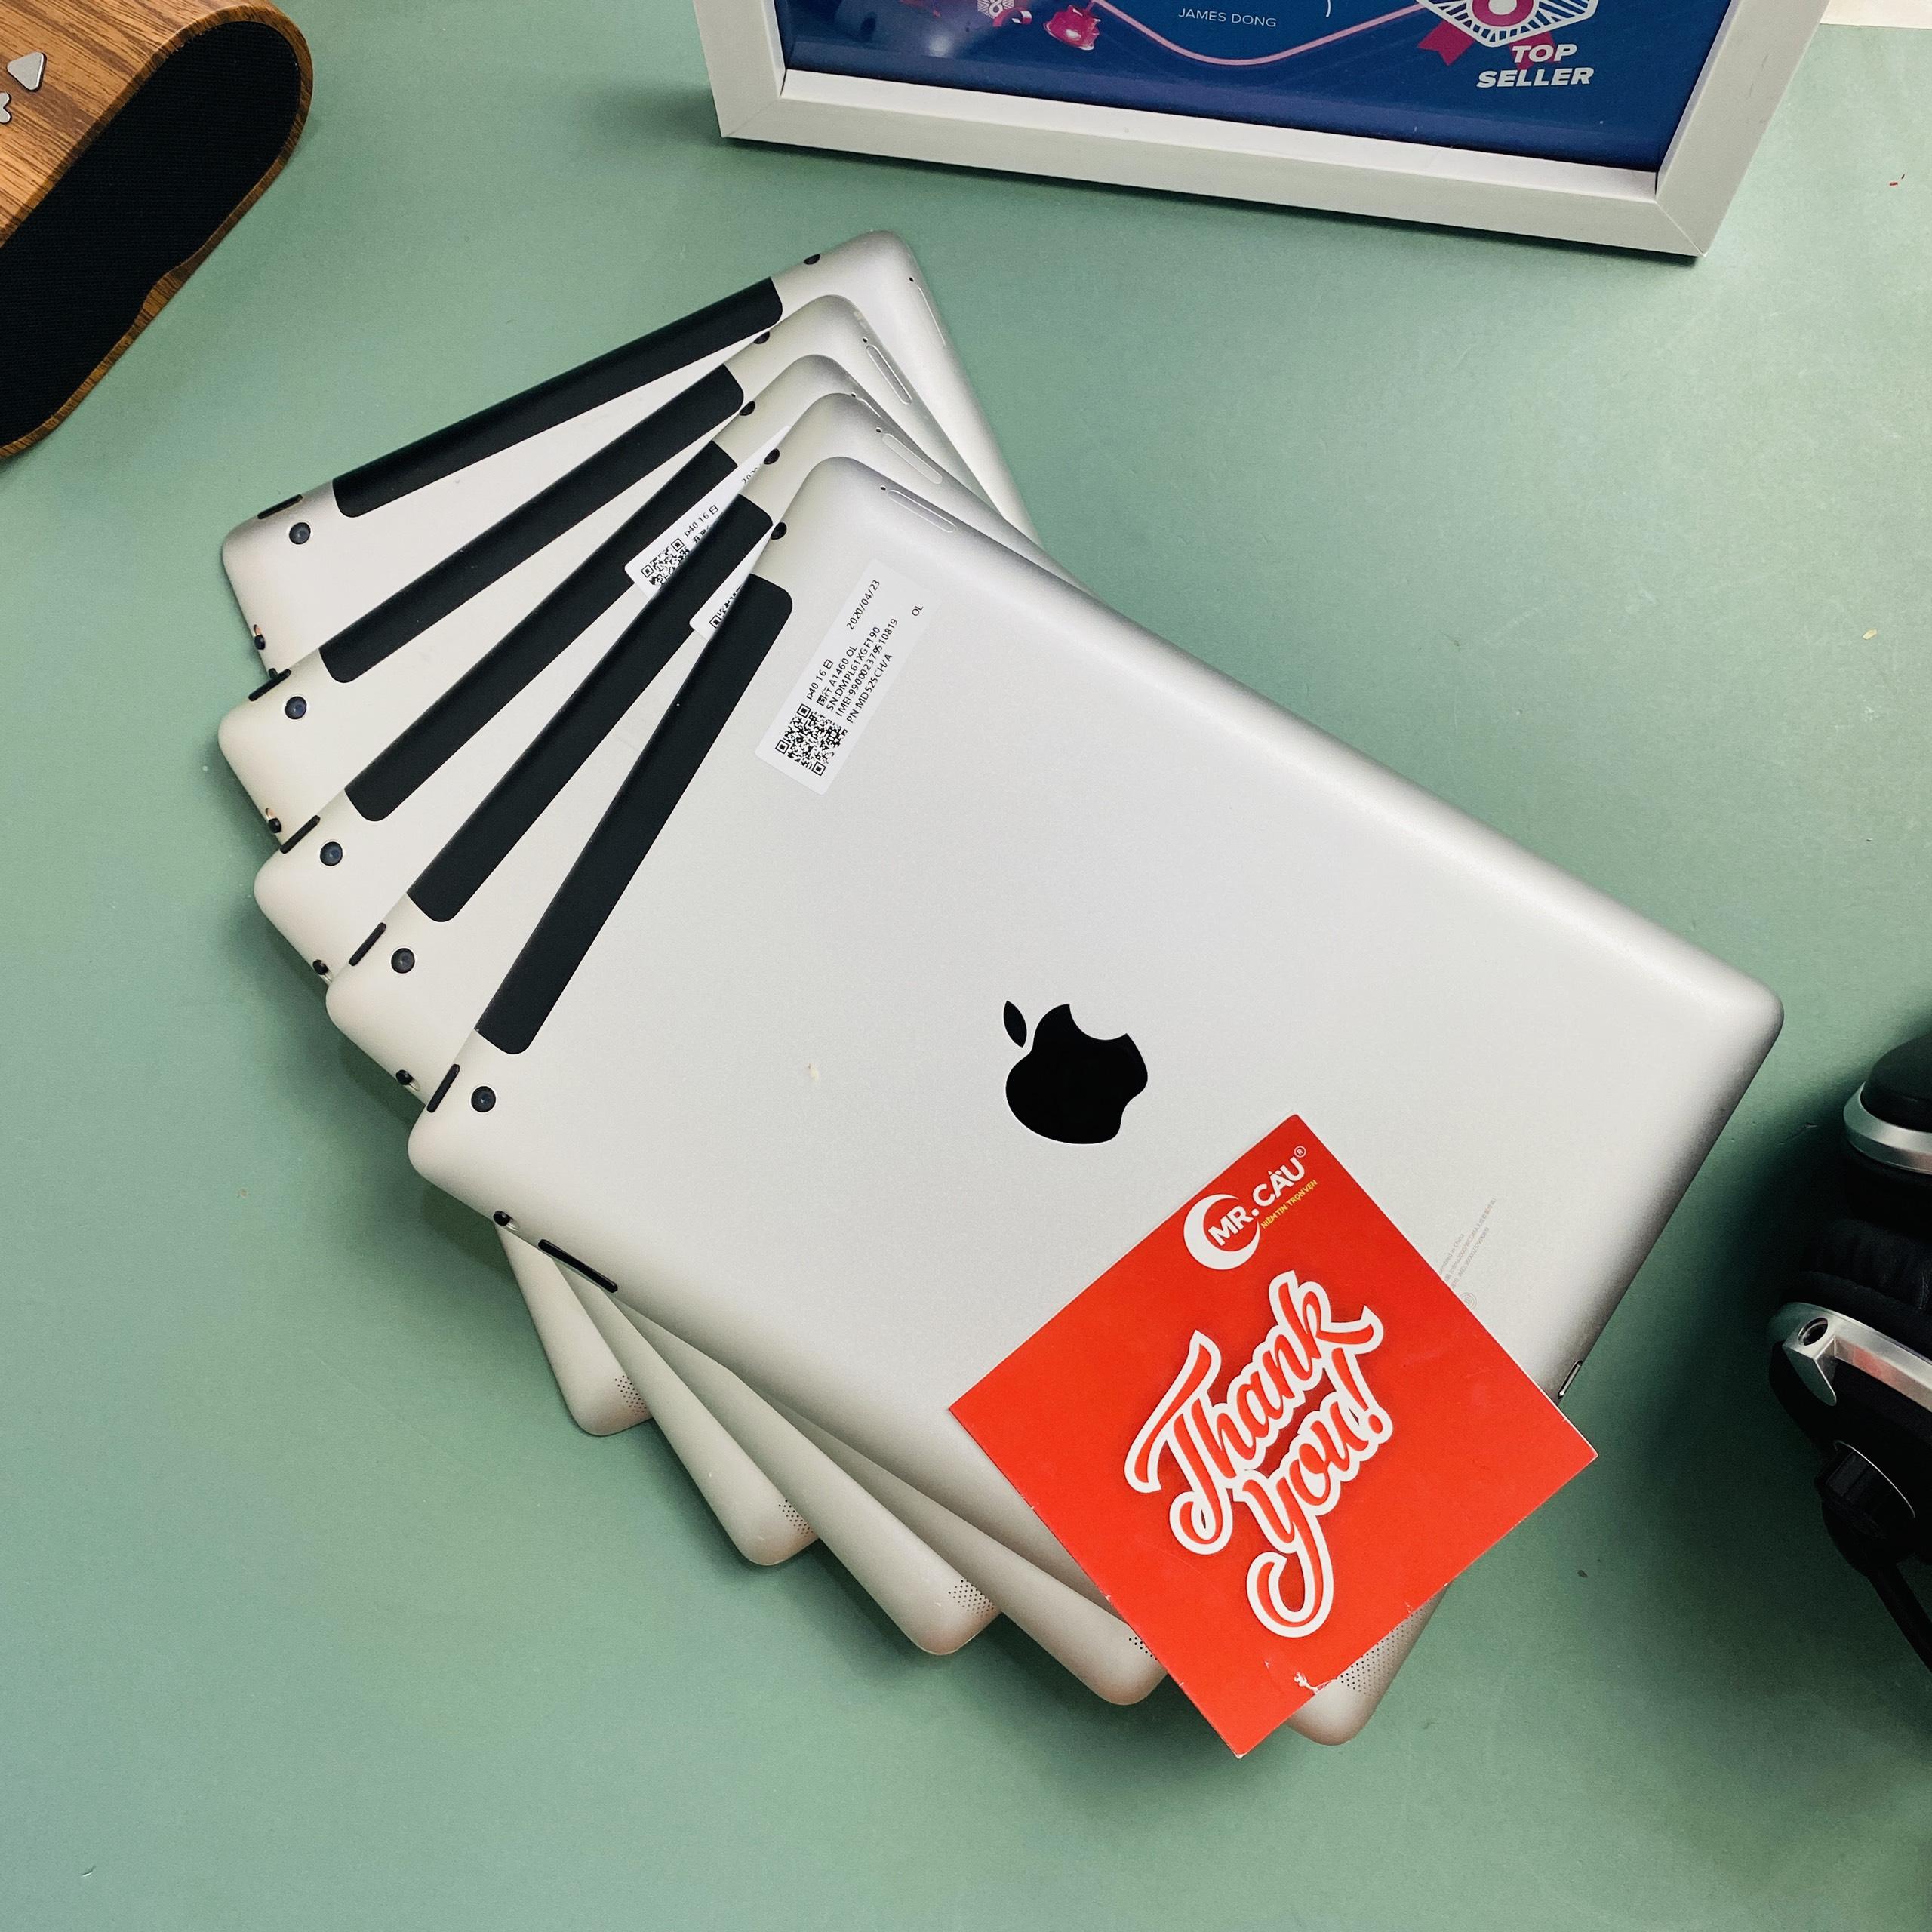 ( Flash Sale GIẢM 250K ) Máy tính bảng Apple IPAD 4 -(4G+ Wifi) , RAM 1G, Chip Apple A6X,...